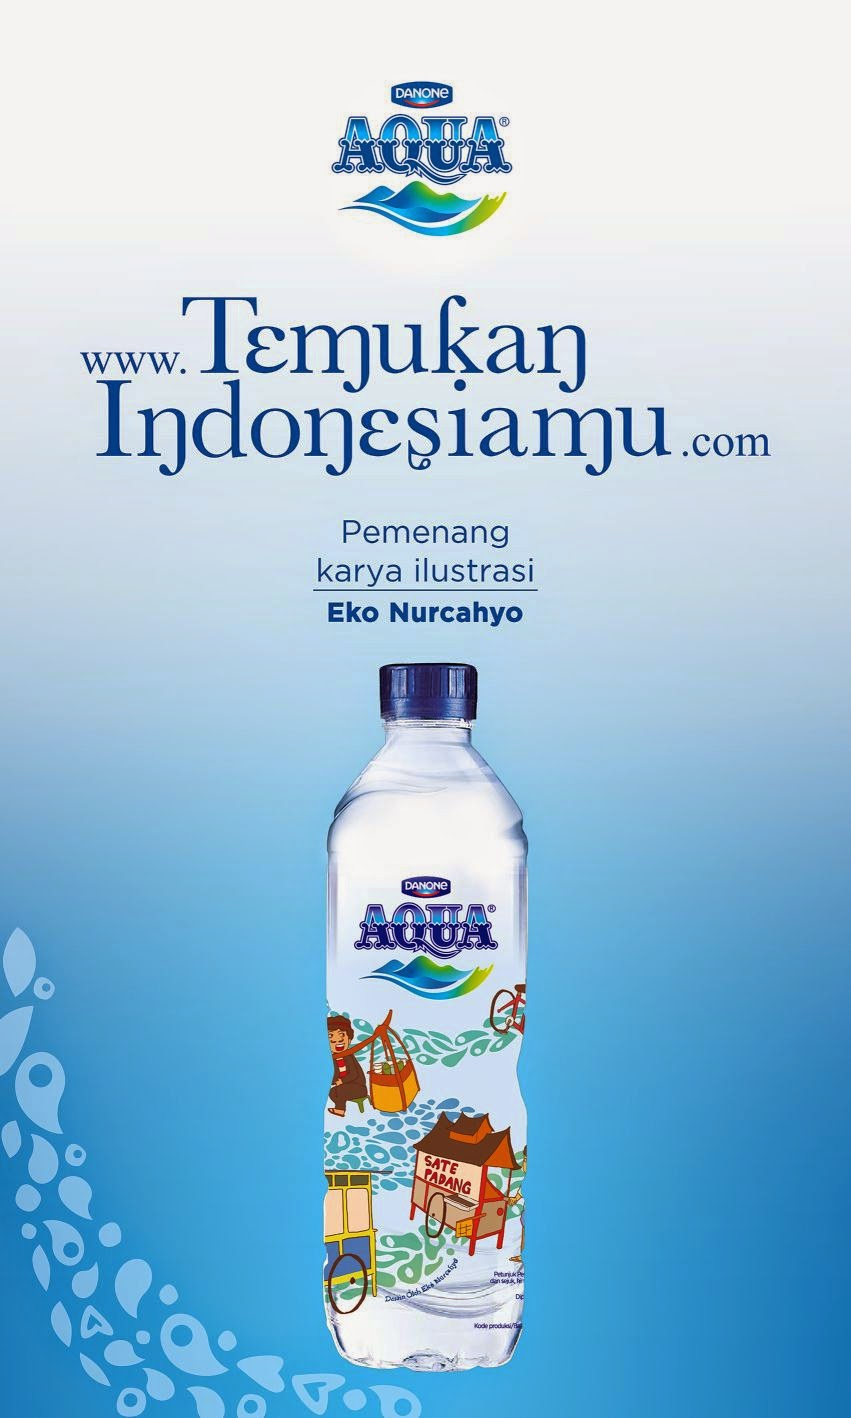 Contoh Iklan Minuman Materi Pelajaran 10